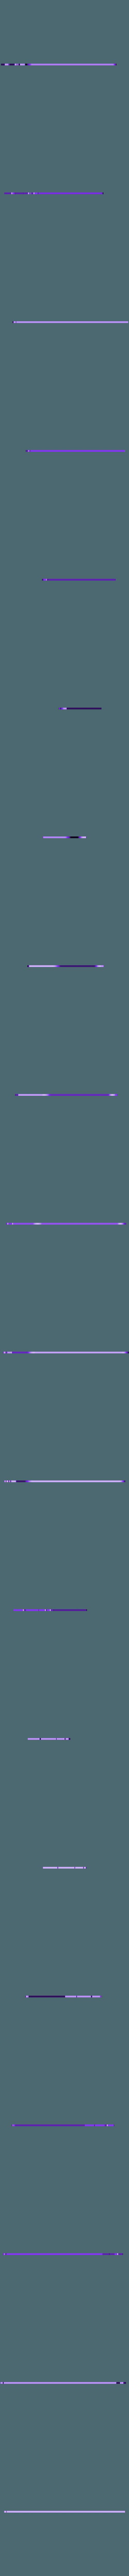 Escuadra_20_cm_v1.stl Download free STL file Shelf bracket set for single track slot • 3D printer design, dancingchicken